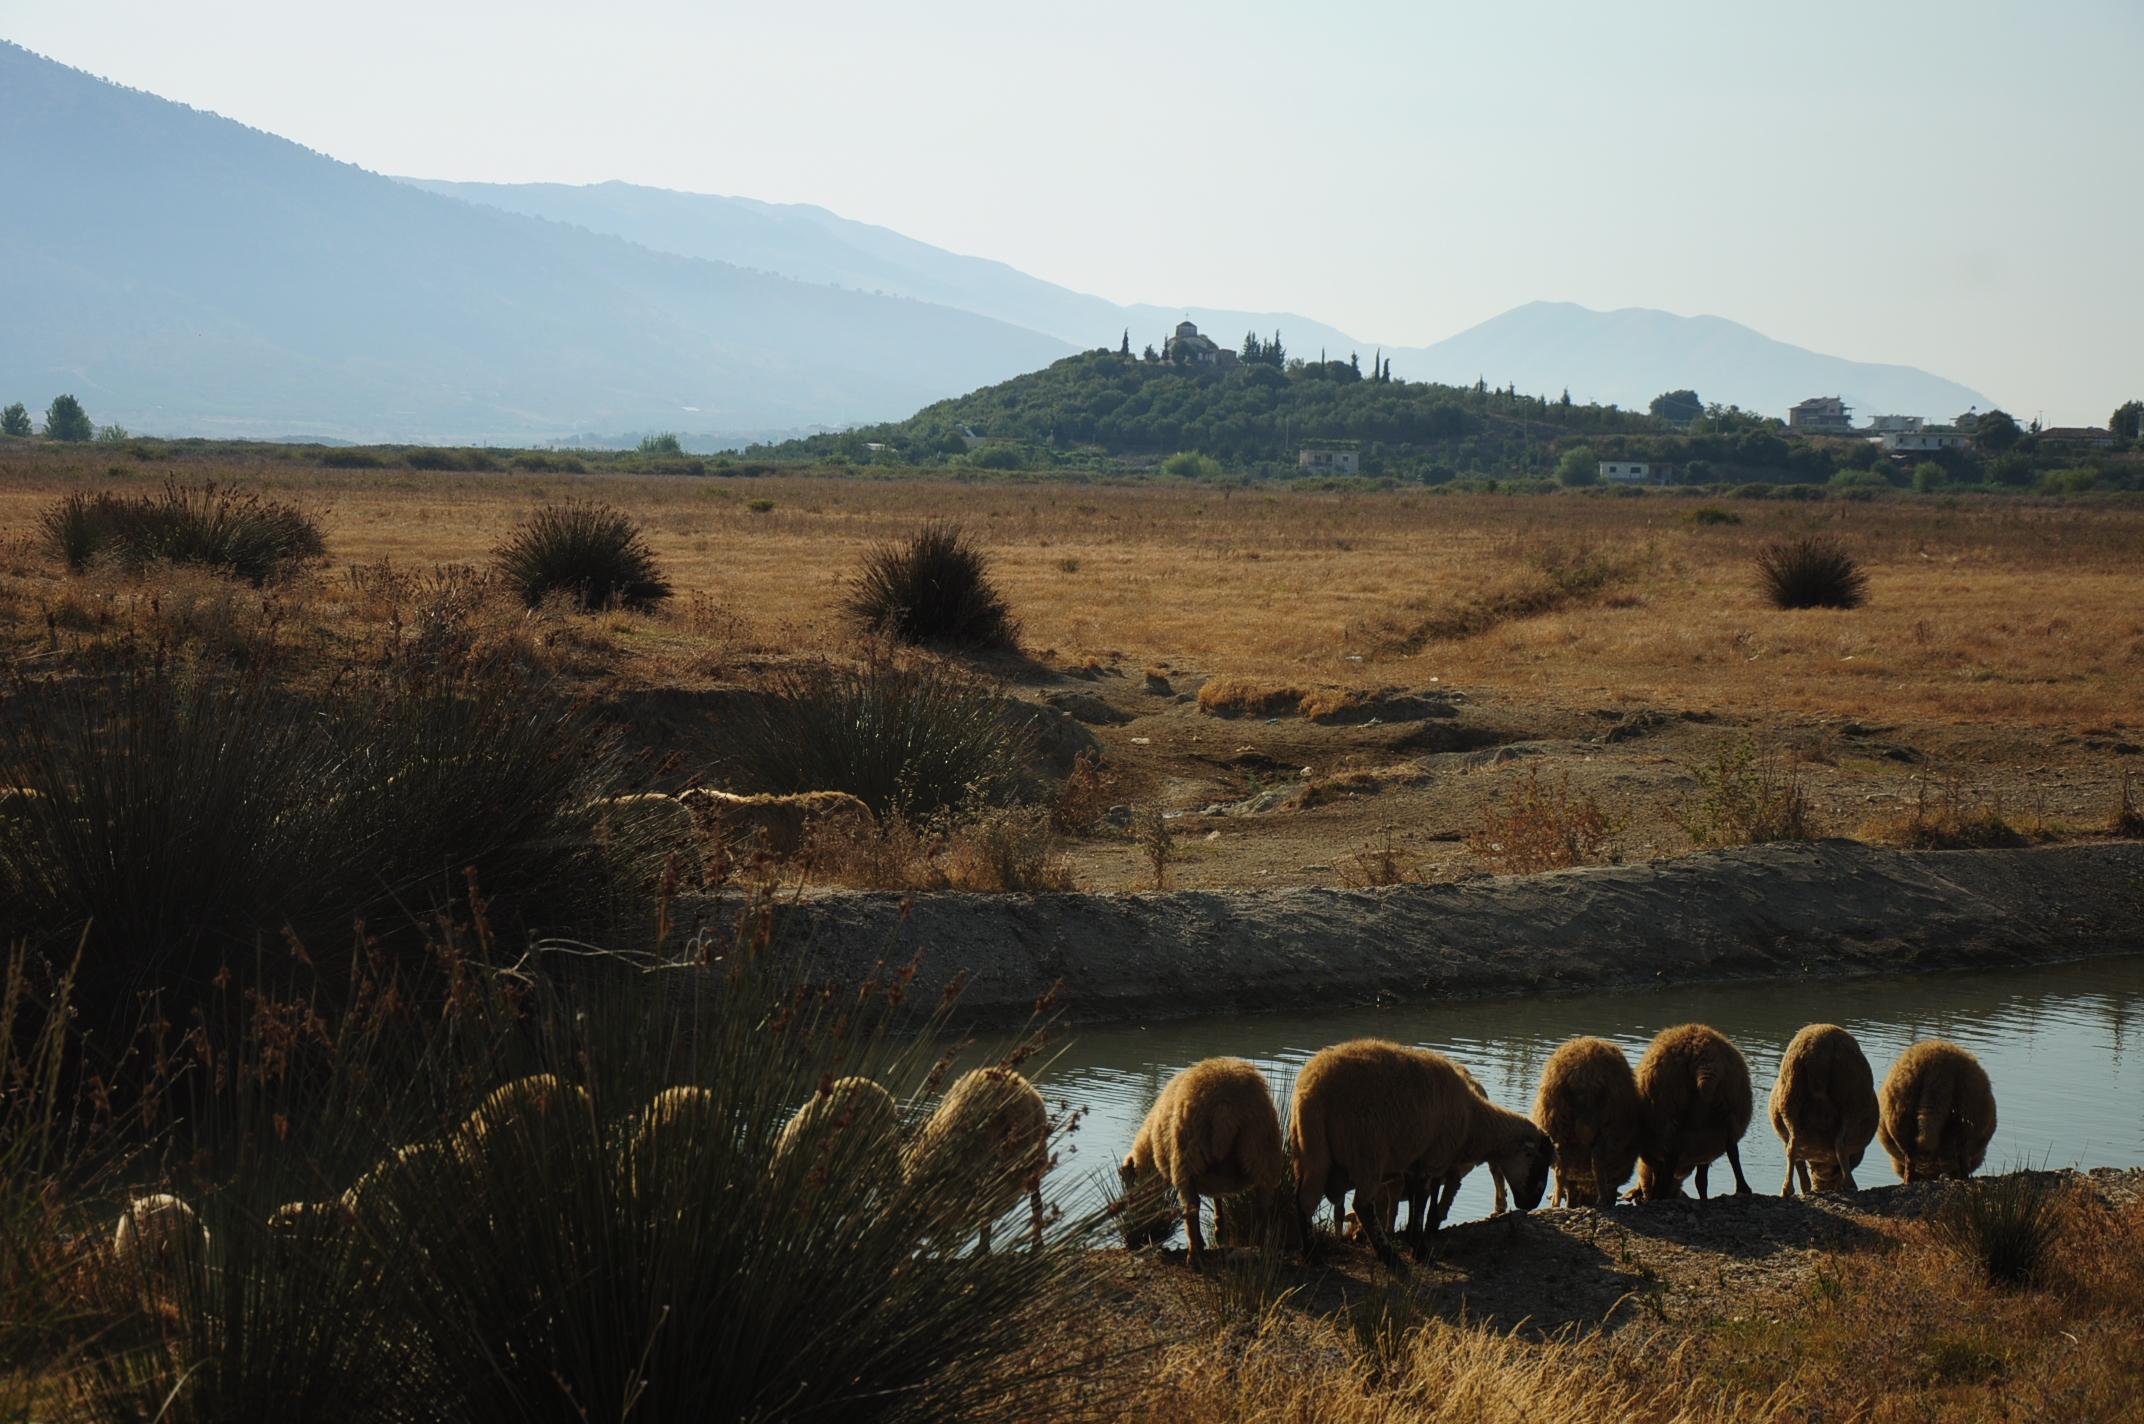 Grazing sheep near Butrint